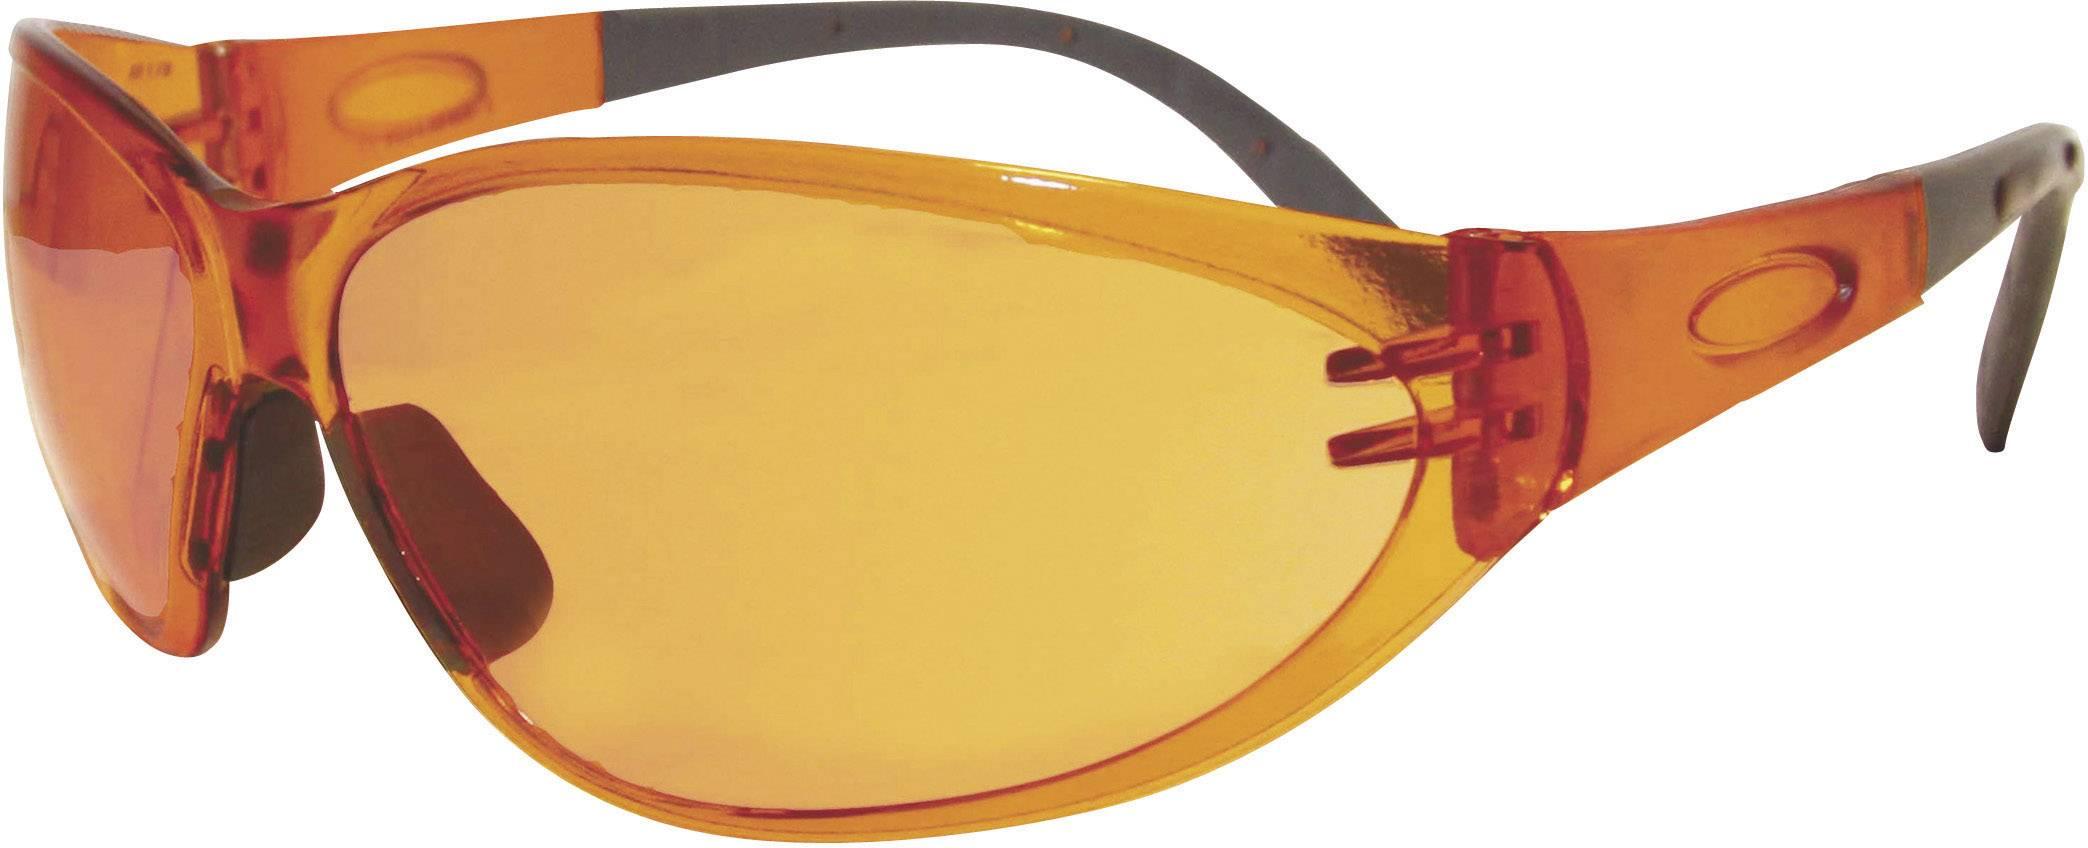 Ochranné okuliare Leipold & Dohle Orange